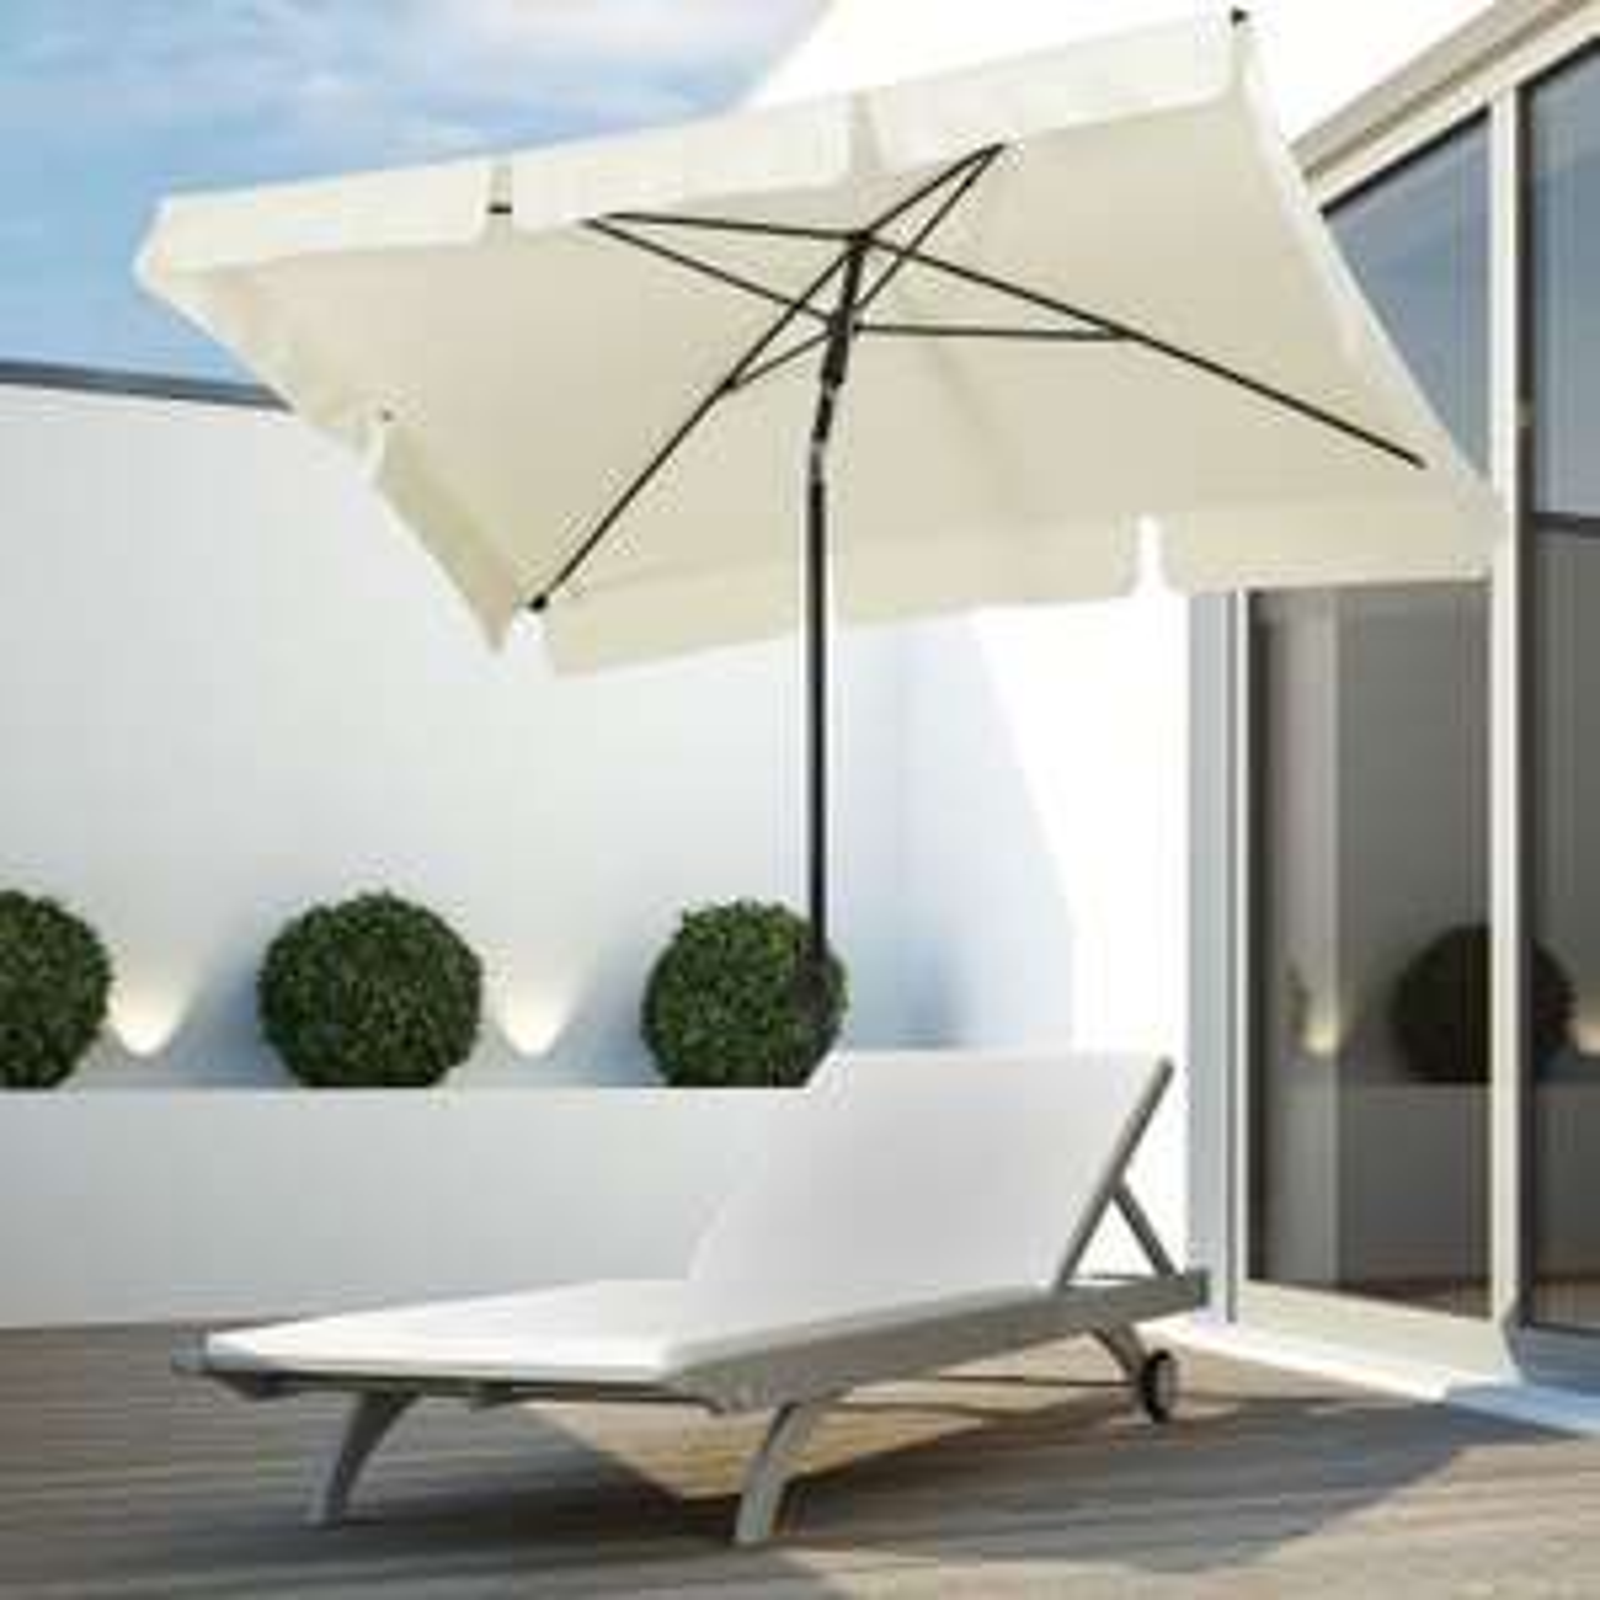 Outsunny square umbrella parasol in cream fabric with aluminium frame for £31.07 delivered using code @ Aosom